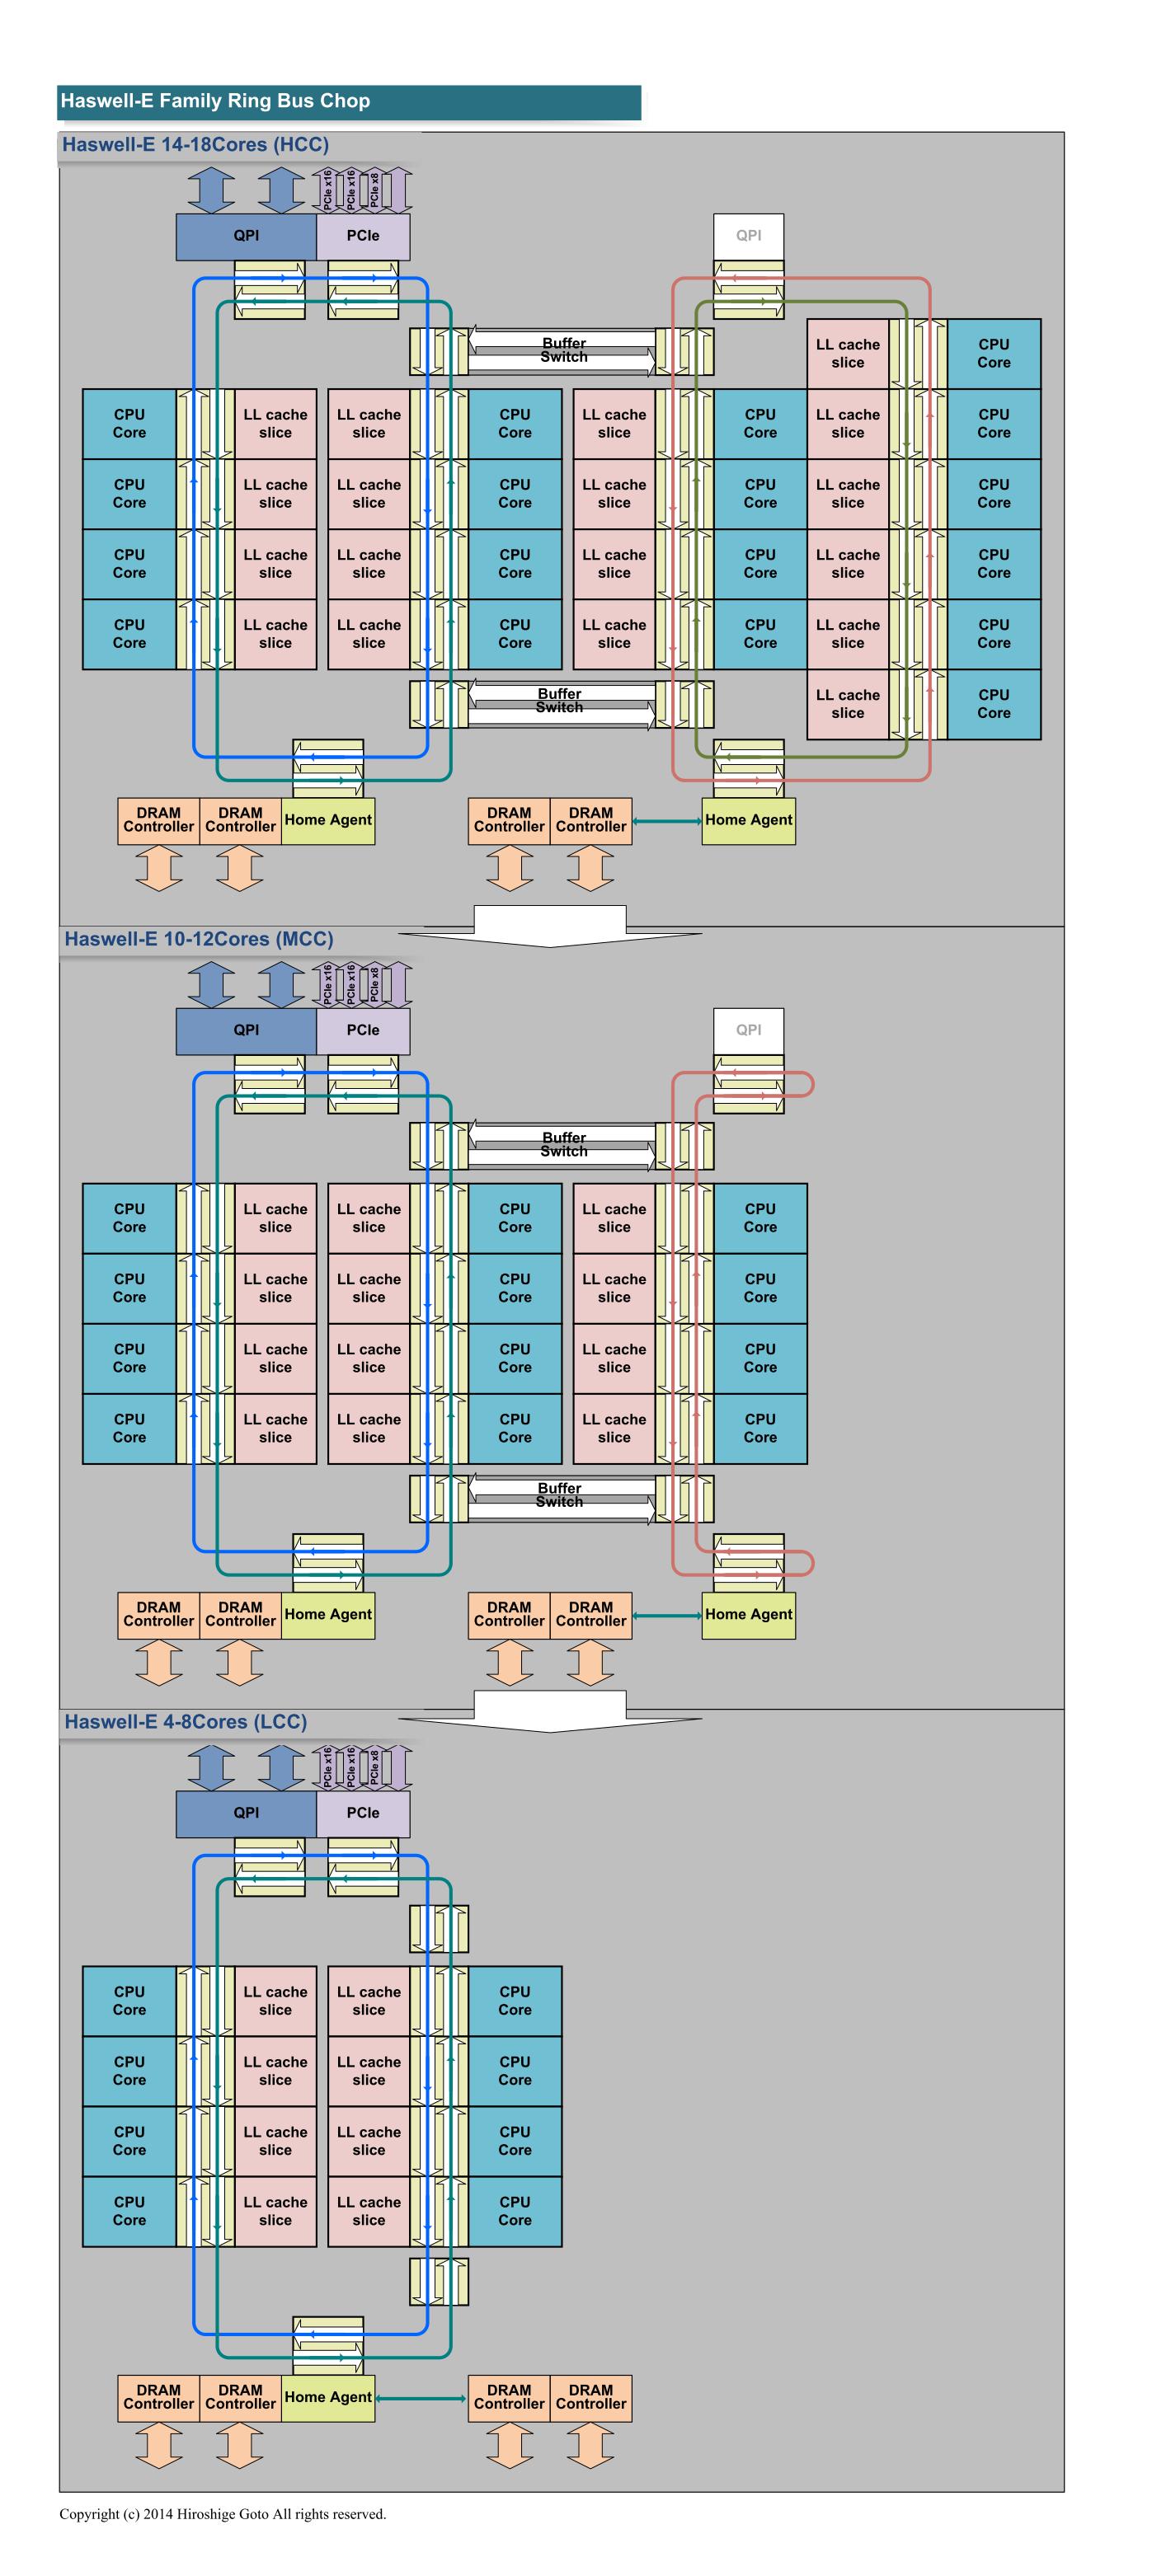 "Haswell-Eファミリの各ダイのリングバス構成(PDF版は<span class=""img-inline raw""><a href=""/video/pcw/docs/665/735/p15.pdf"" ipw_status=""1"" ipw_linktype=""filelink_raw"" class=""resource"">こちら</a></span>)"